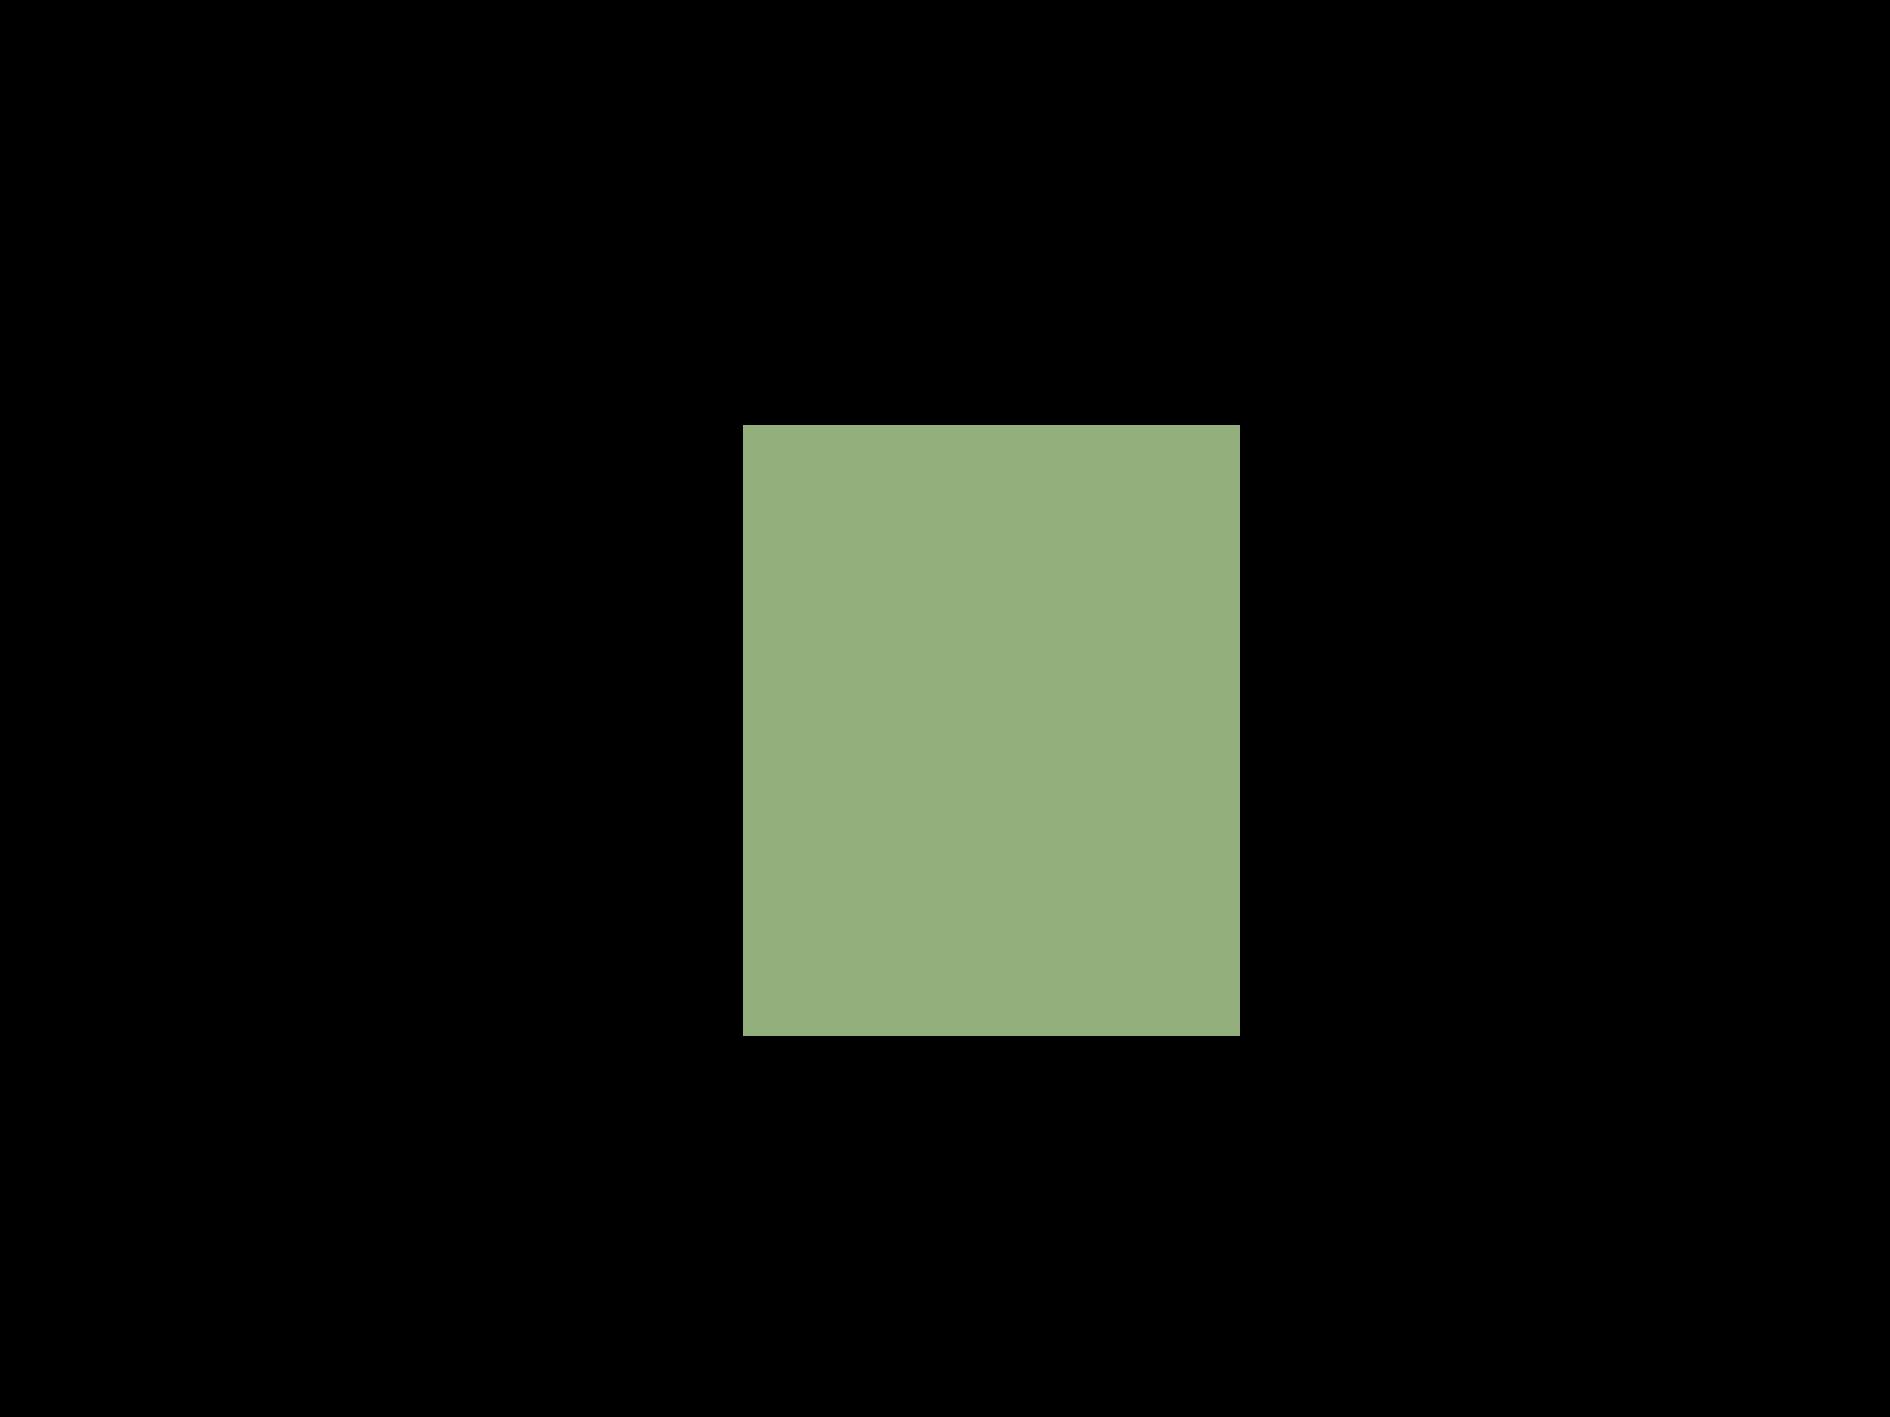 Qualifikationen Icon